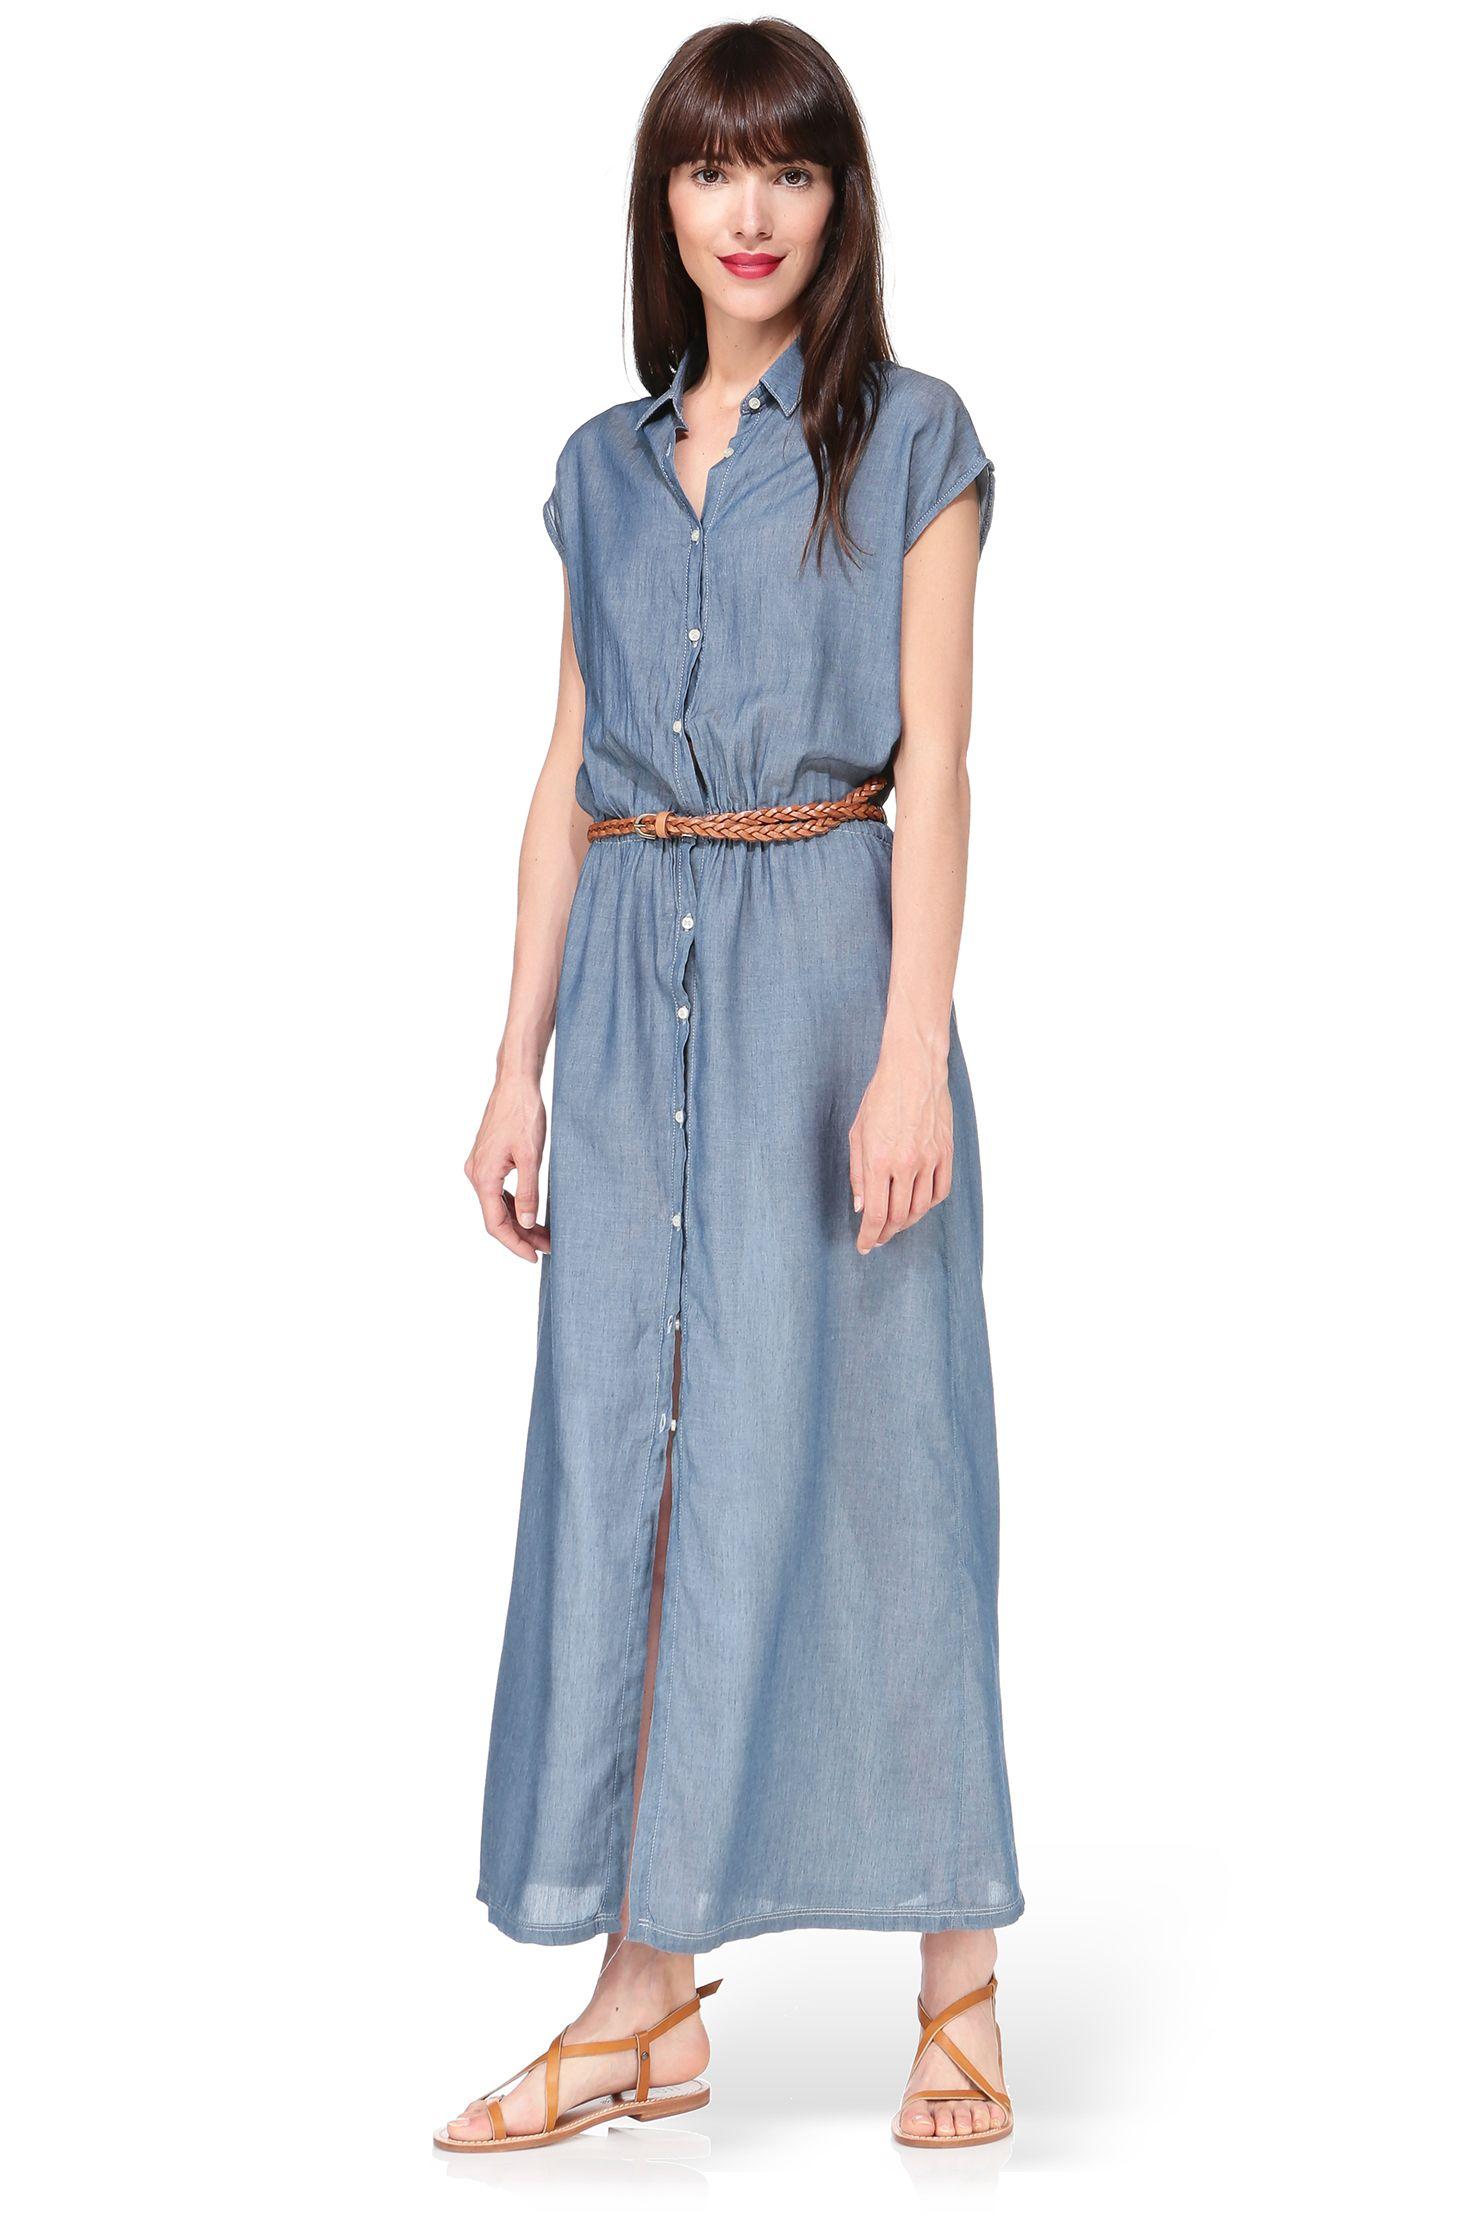 Robe chemise longue denim Ocala American Vintage sur MonShowroom.com